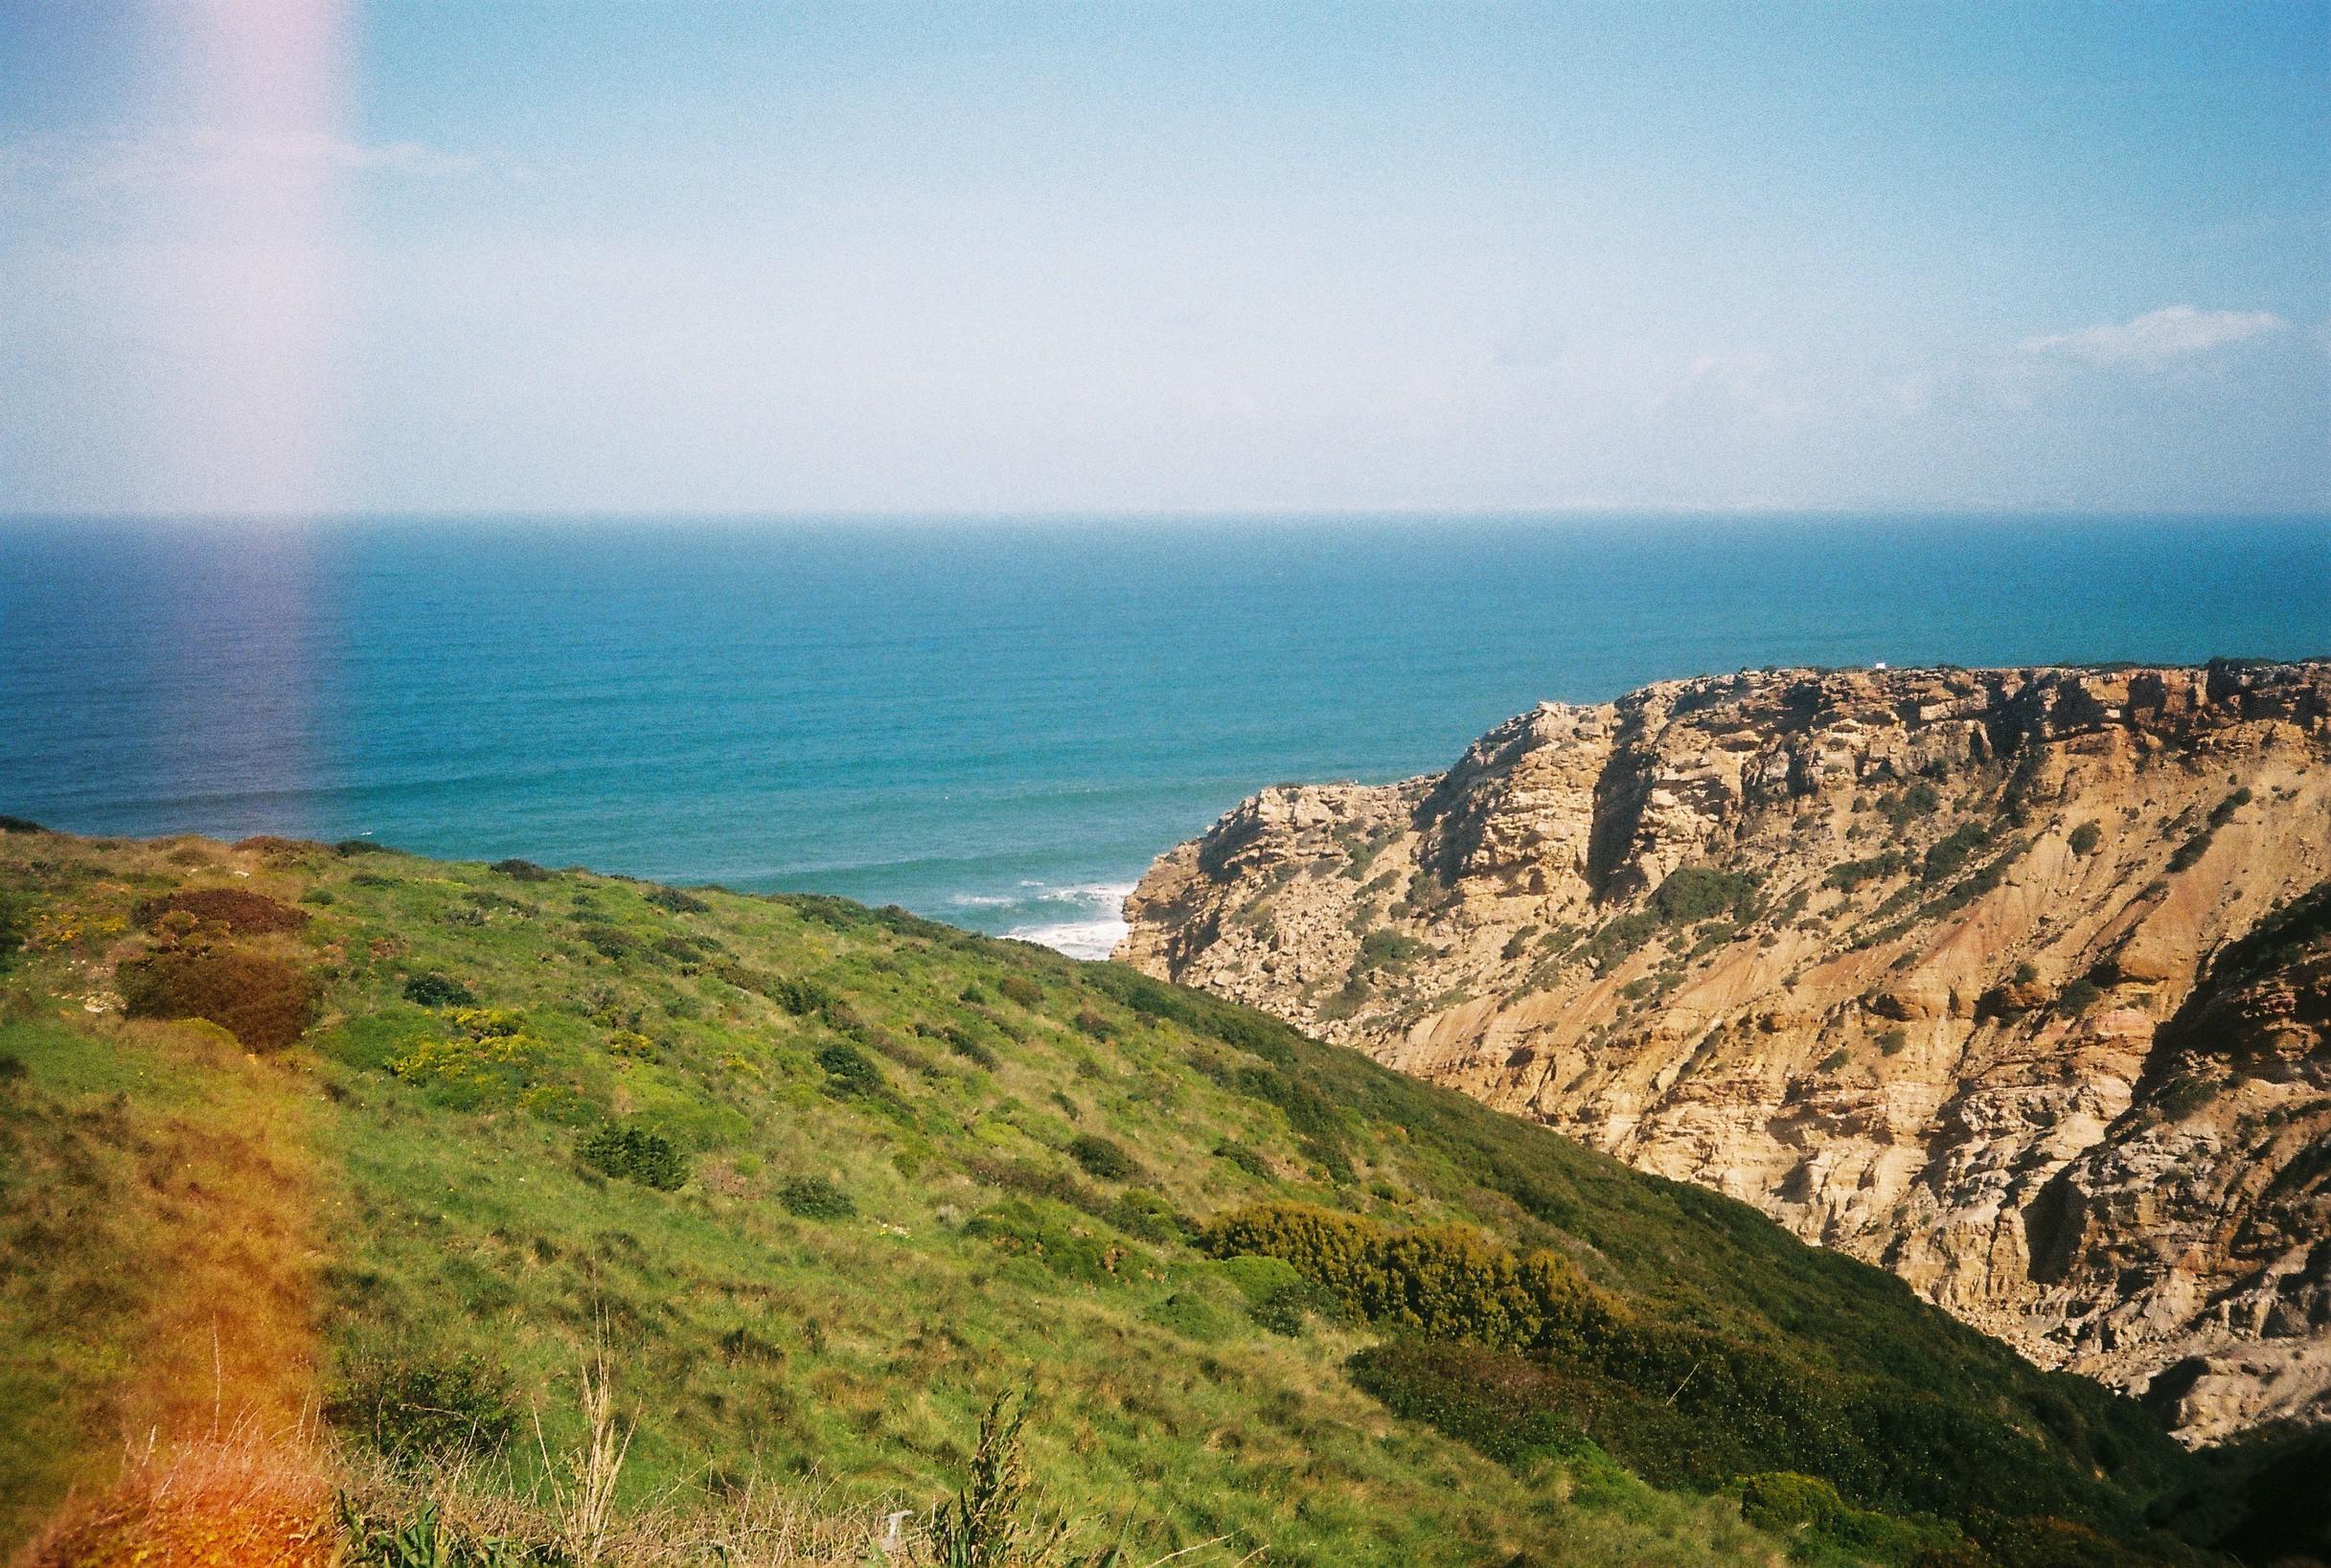 Cabo Espichel Portugal On A 35mm Camera Unedited Oc 2433x1637 35mm Camera Cabo Landscape Photographers